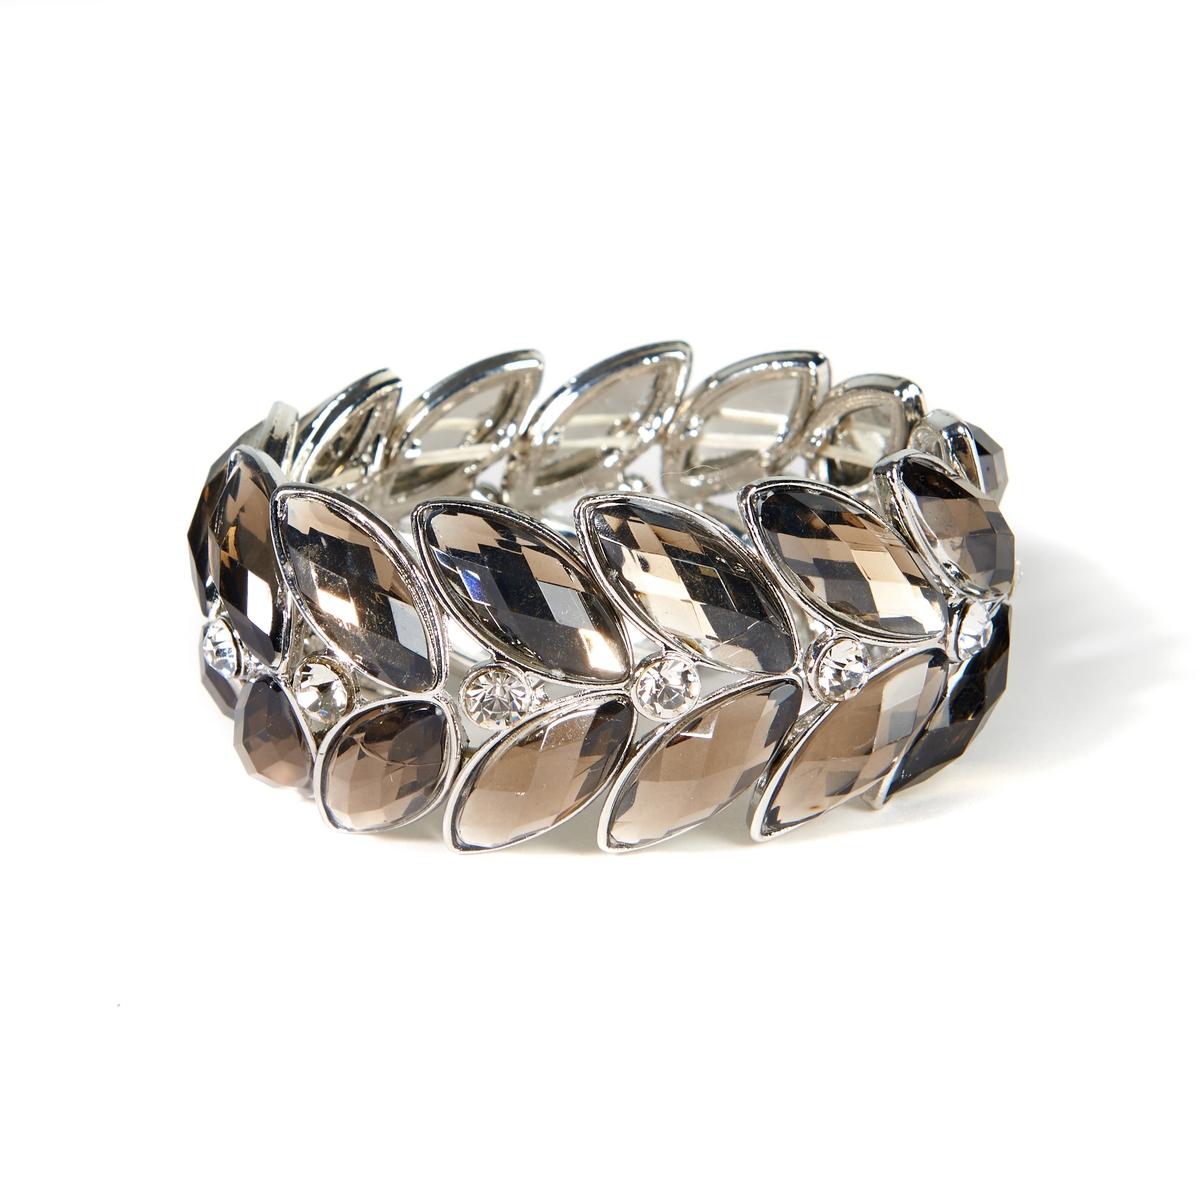 Braccialetto finta pietra e metallo